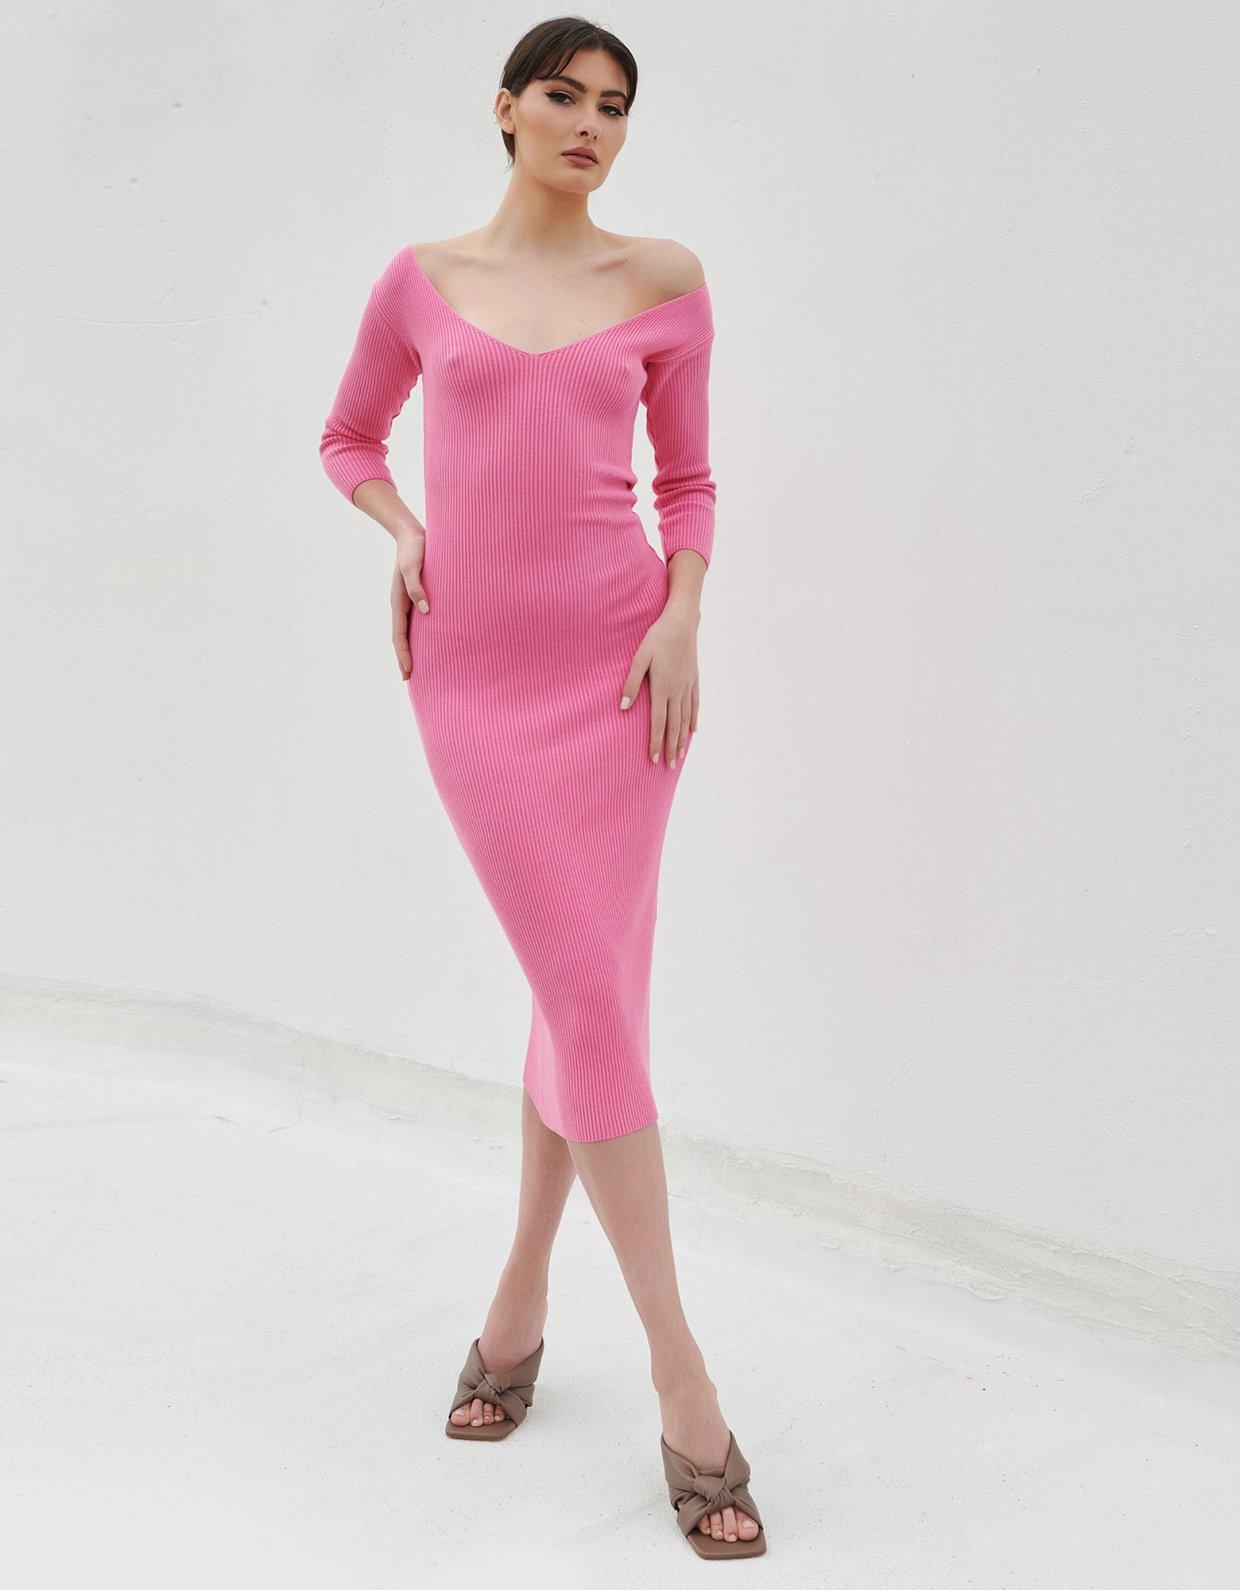 Combos Knitwear Combos S18 – Pink midi dress 3/4